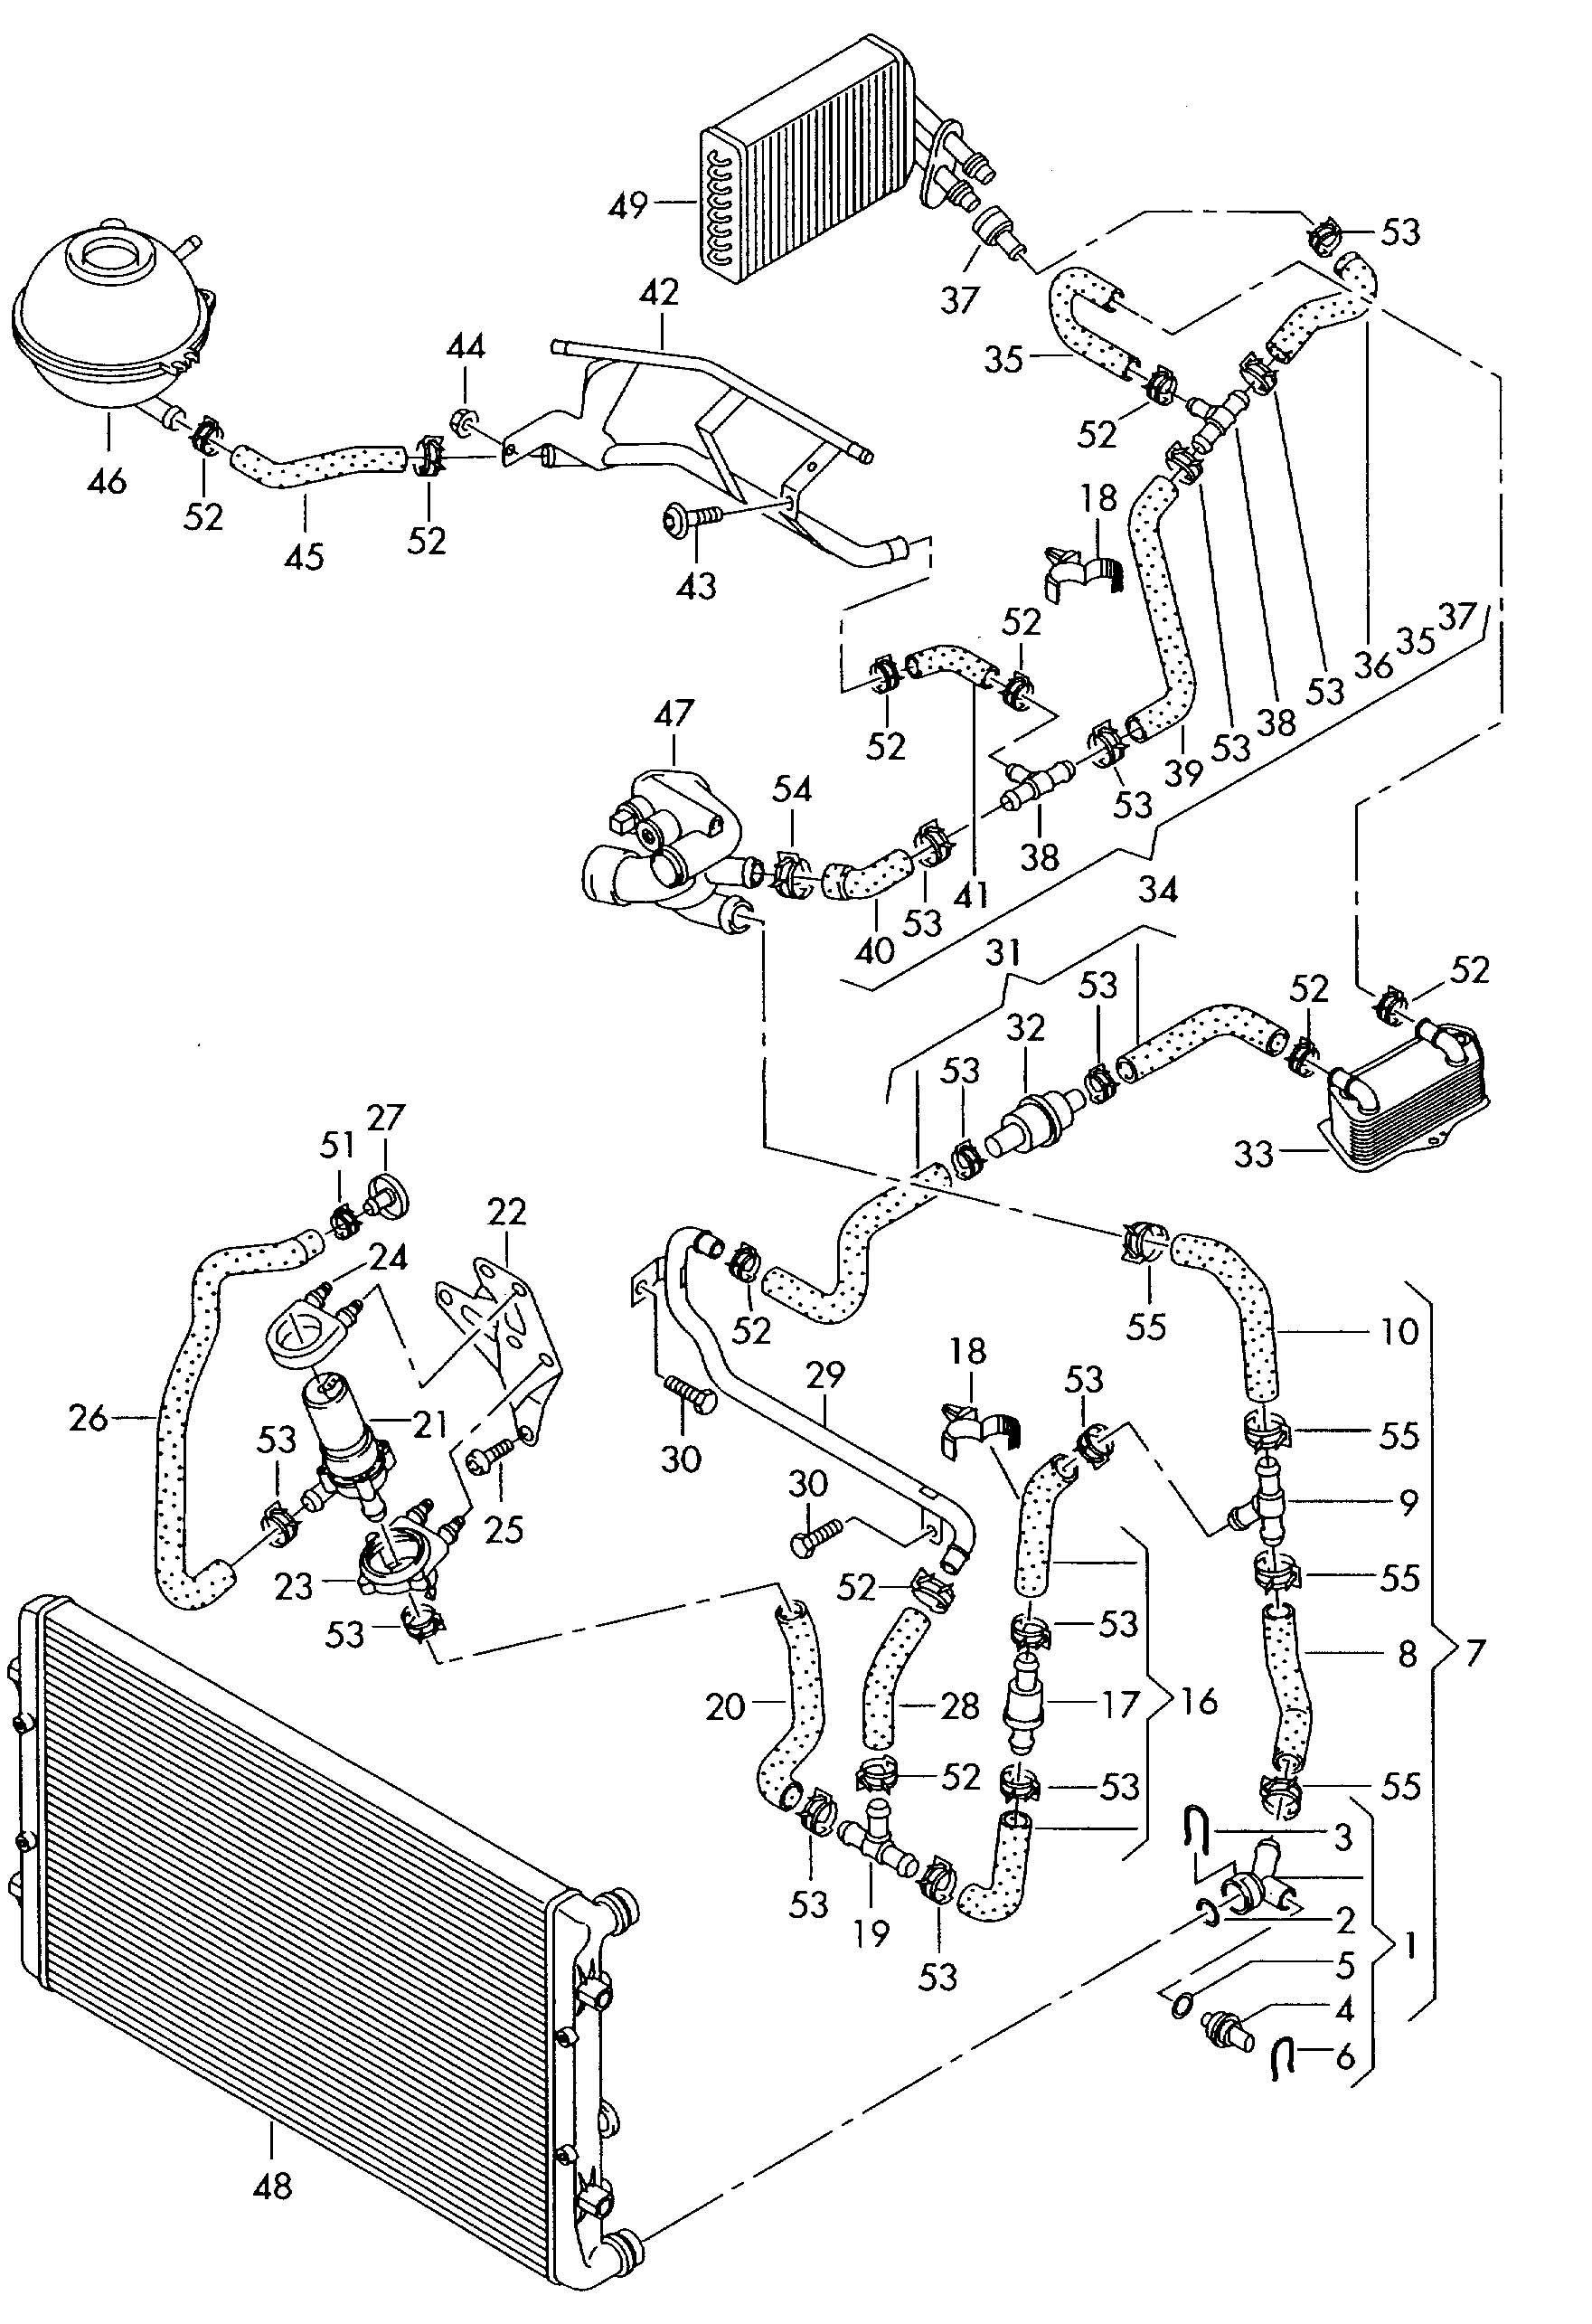 Audi A3 Cooling System Diagram | Audi | Audi a3, Audi, Cars